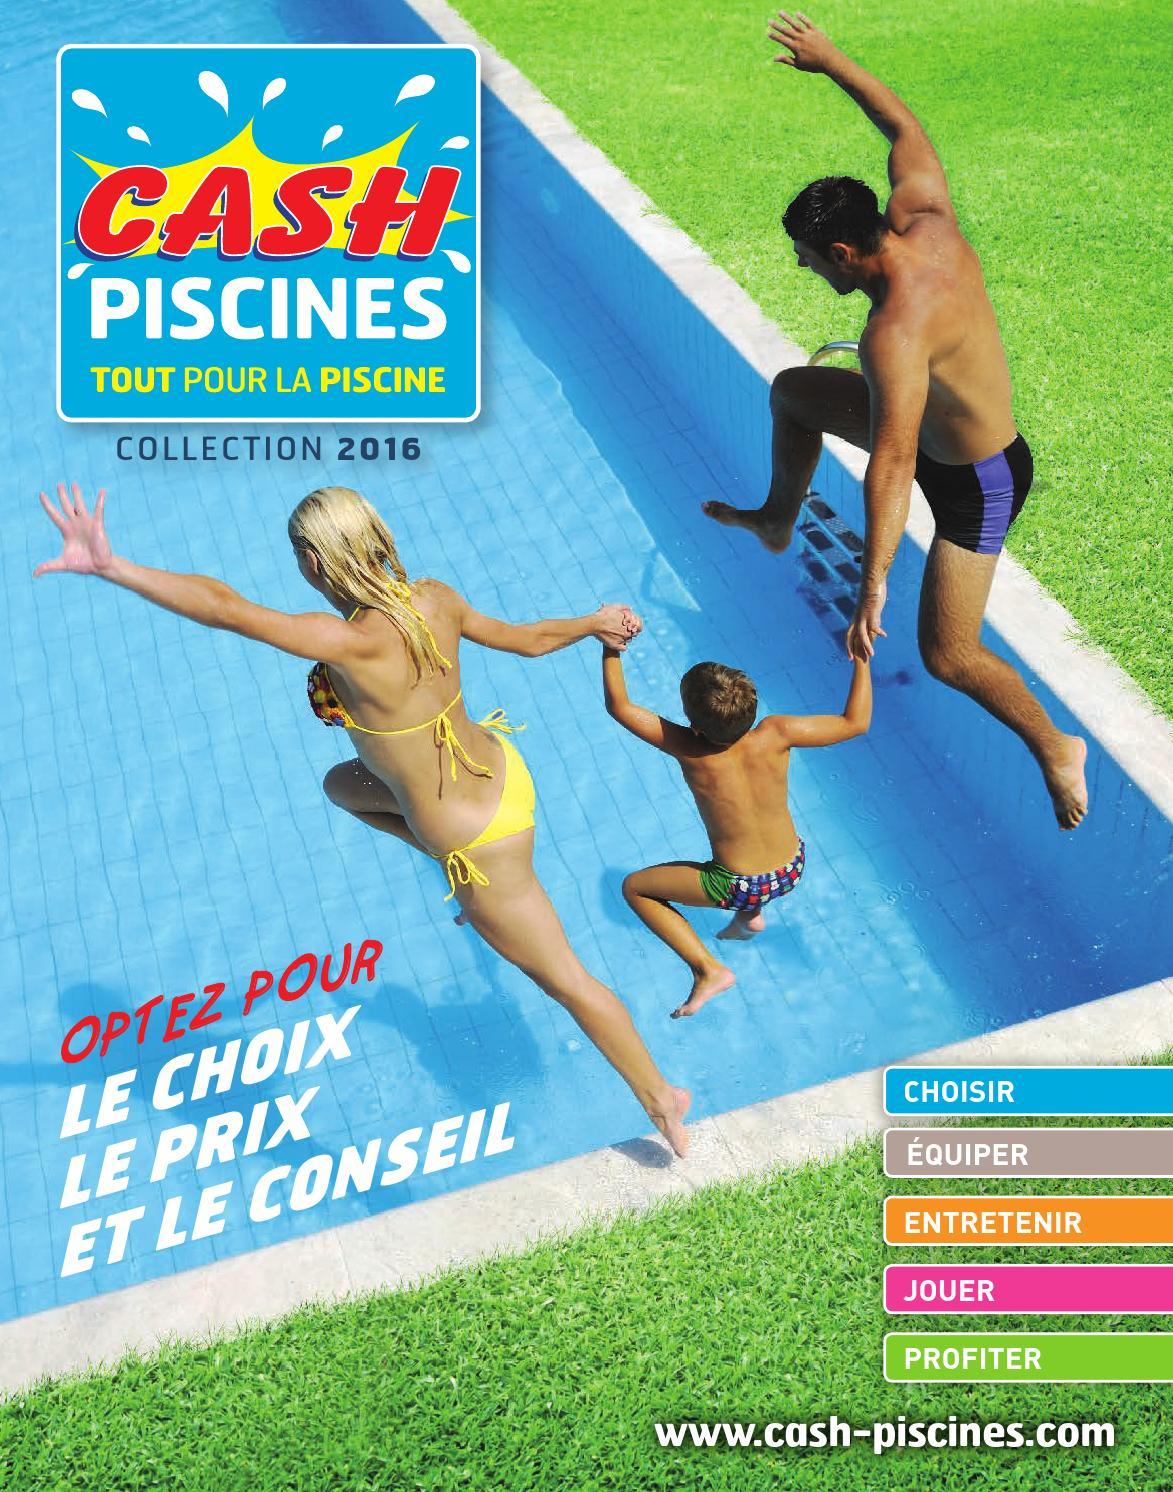 Cash Piscines 2016 By Octave Octave - Issuu concernant Cash Piscine Nimes